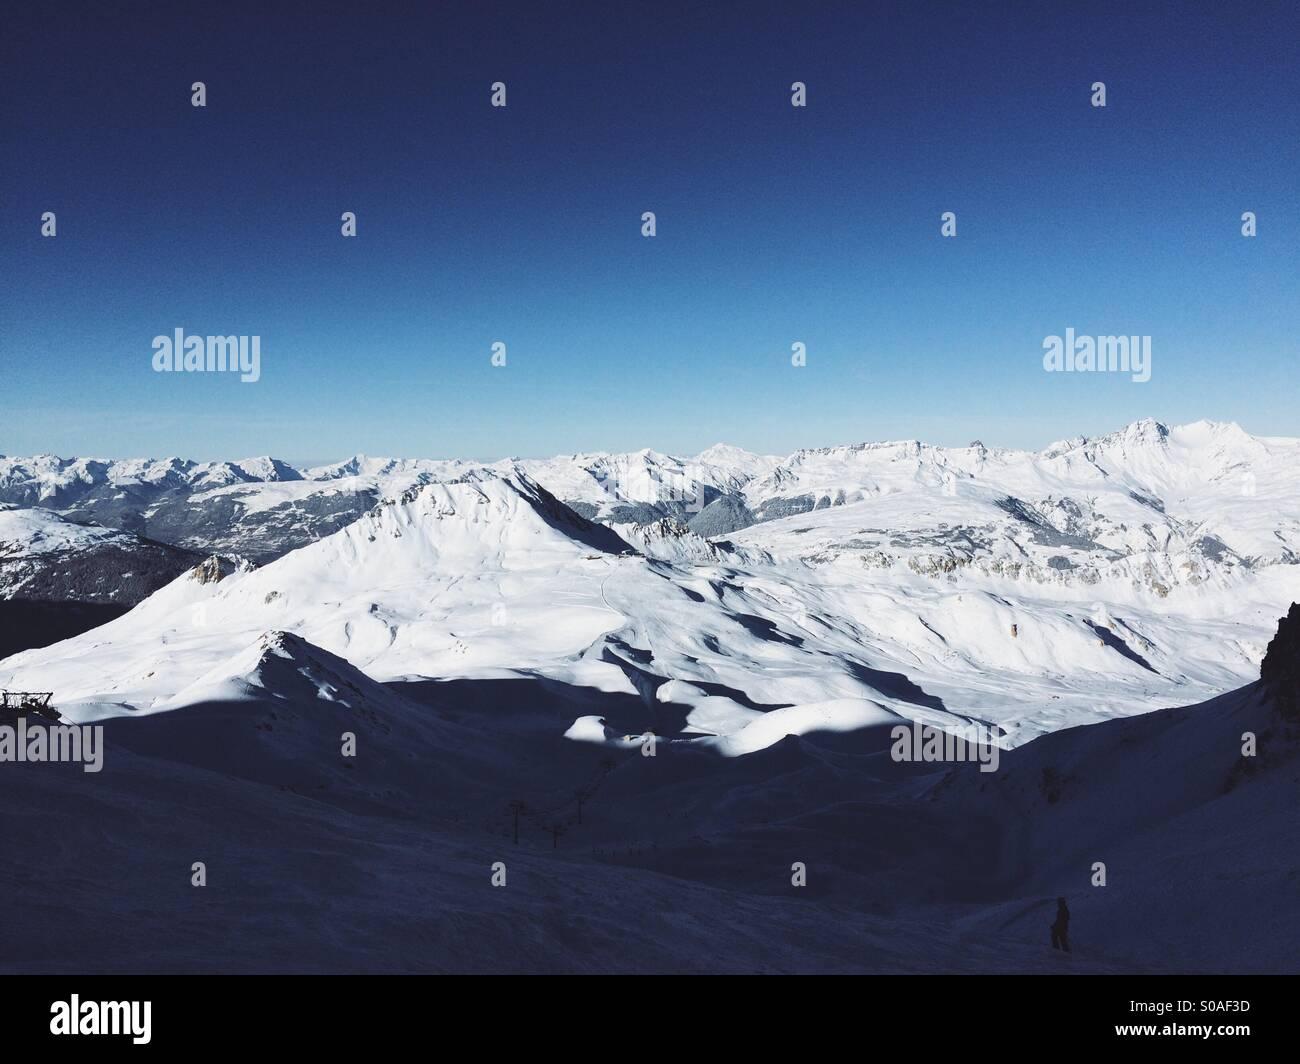 Epic Mountains - Stock Image